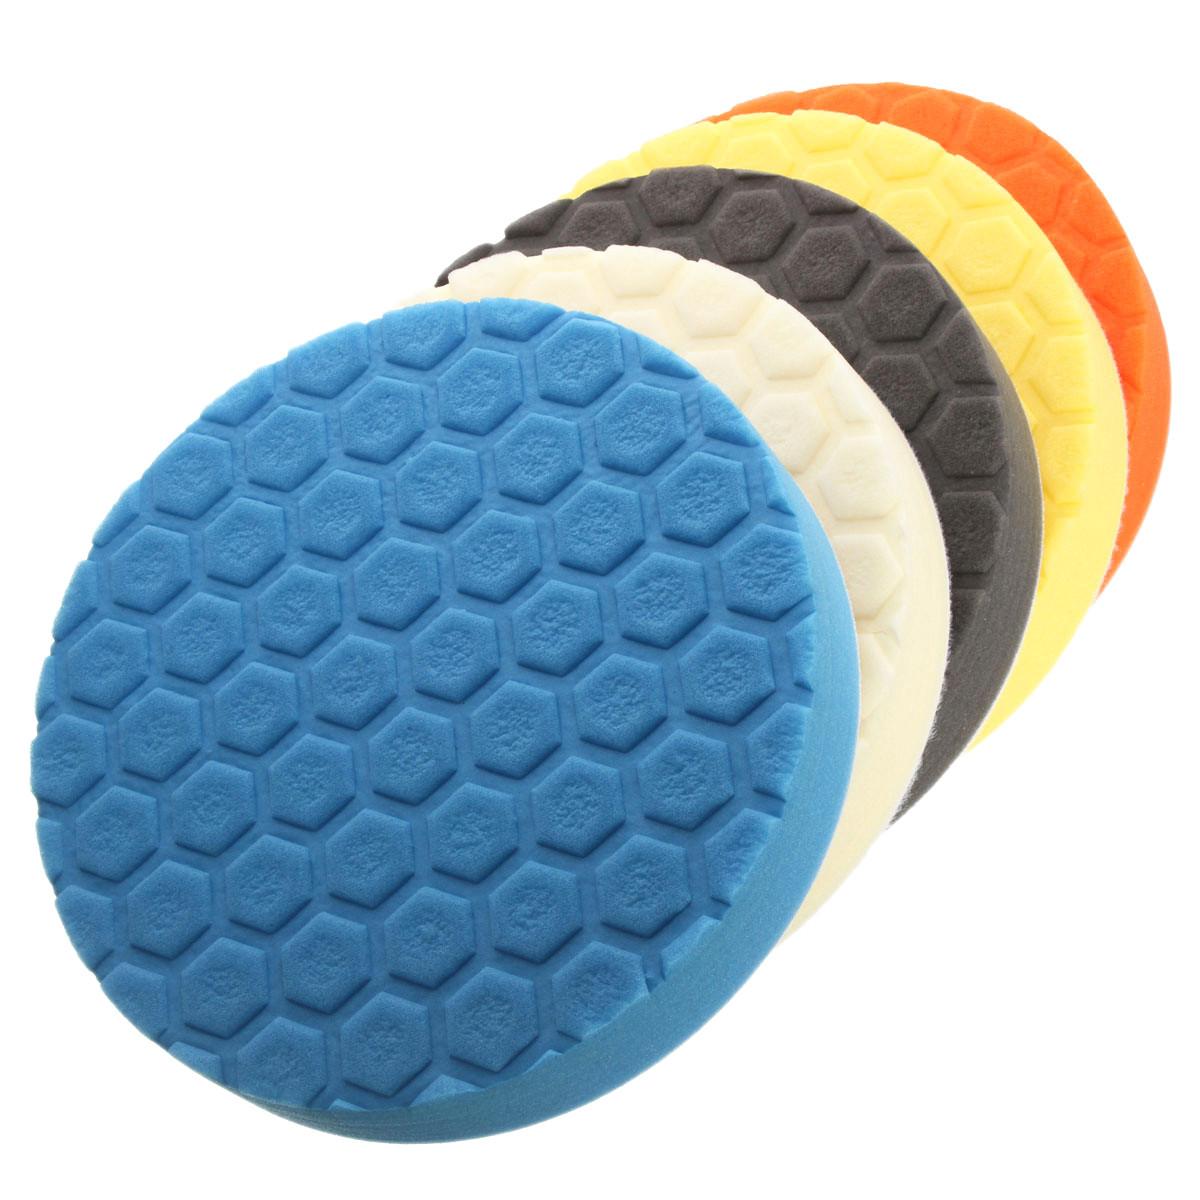 4/5/6/7 Inch Hex-Logic Sponge Polishing Pad Buffing Kit